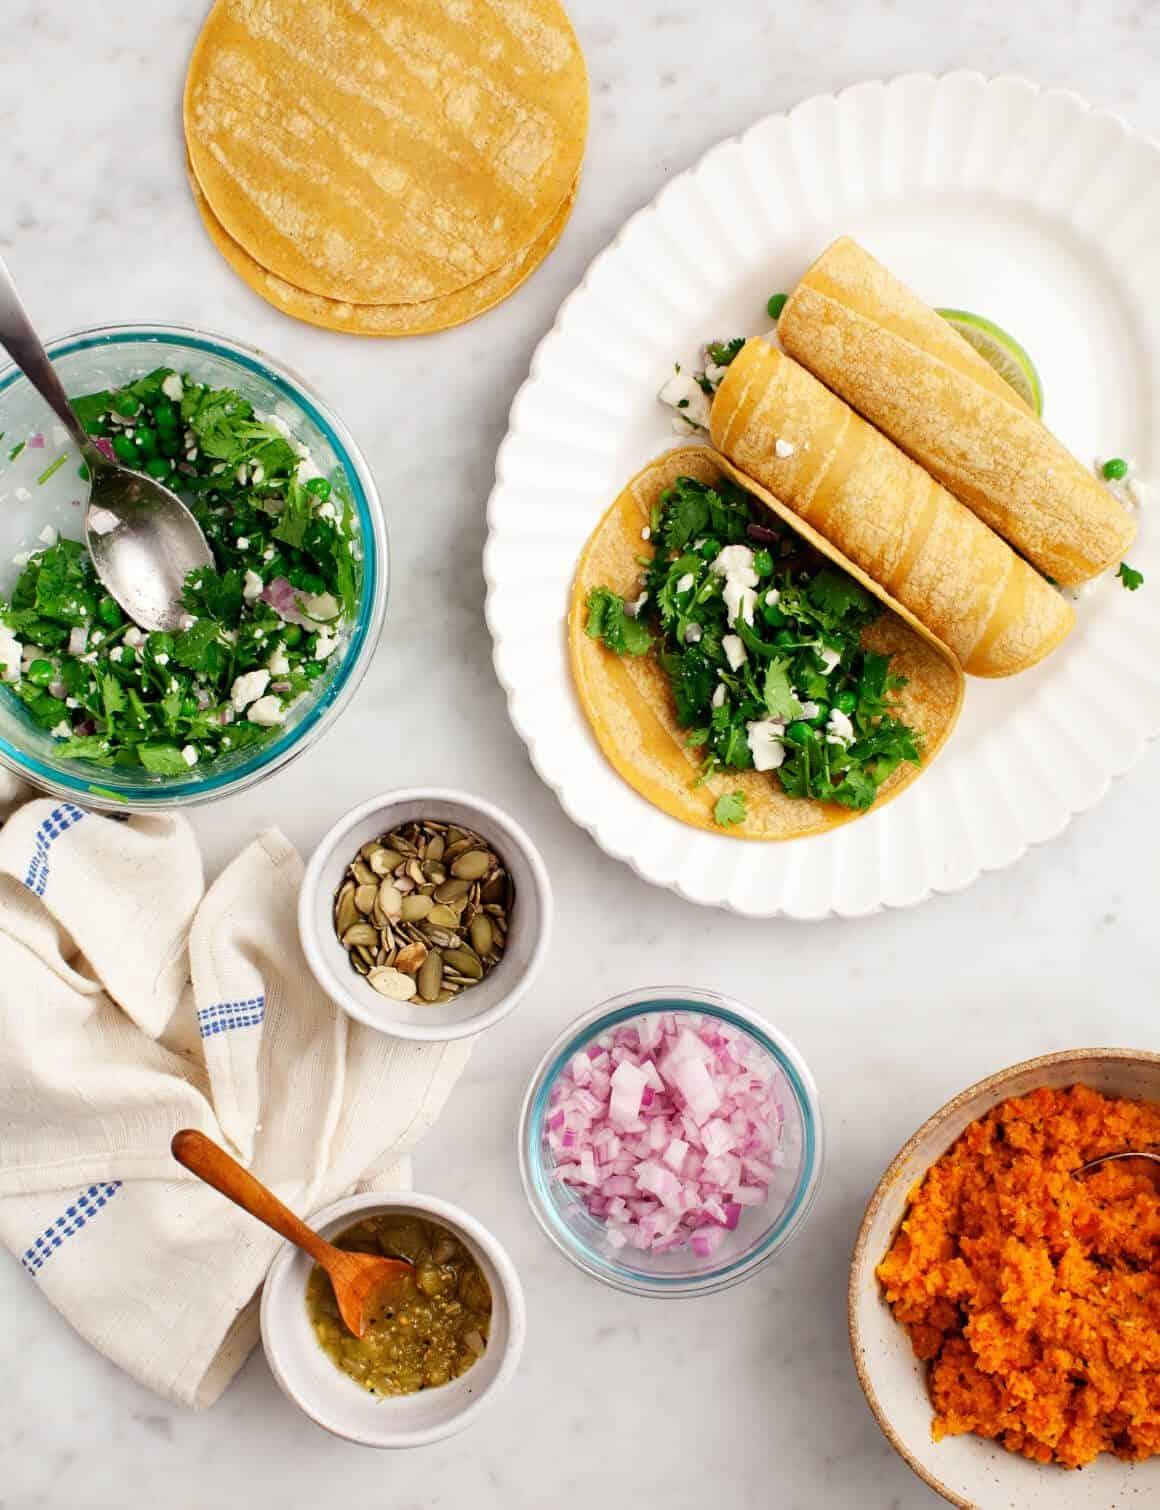 No-Bake Sweet Pea Enchiladas from Modern Potluck